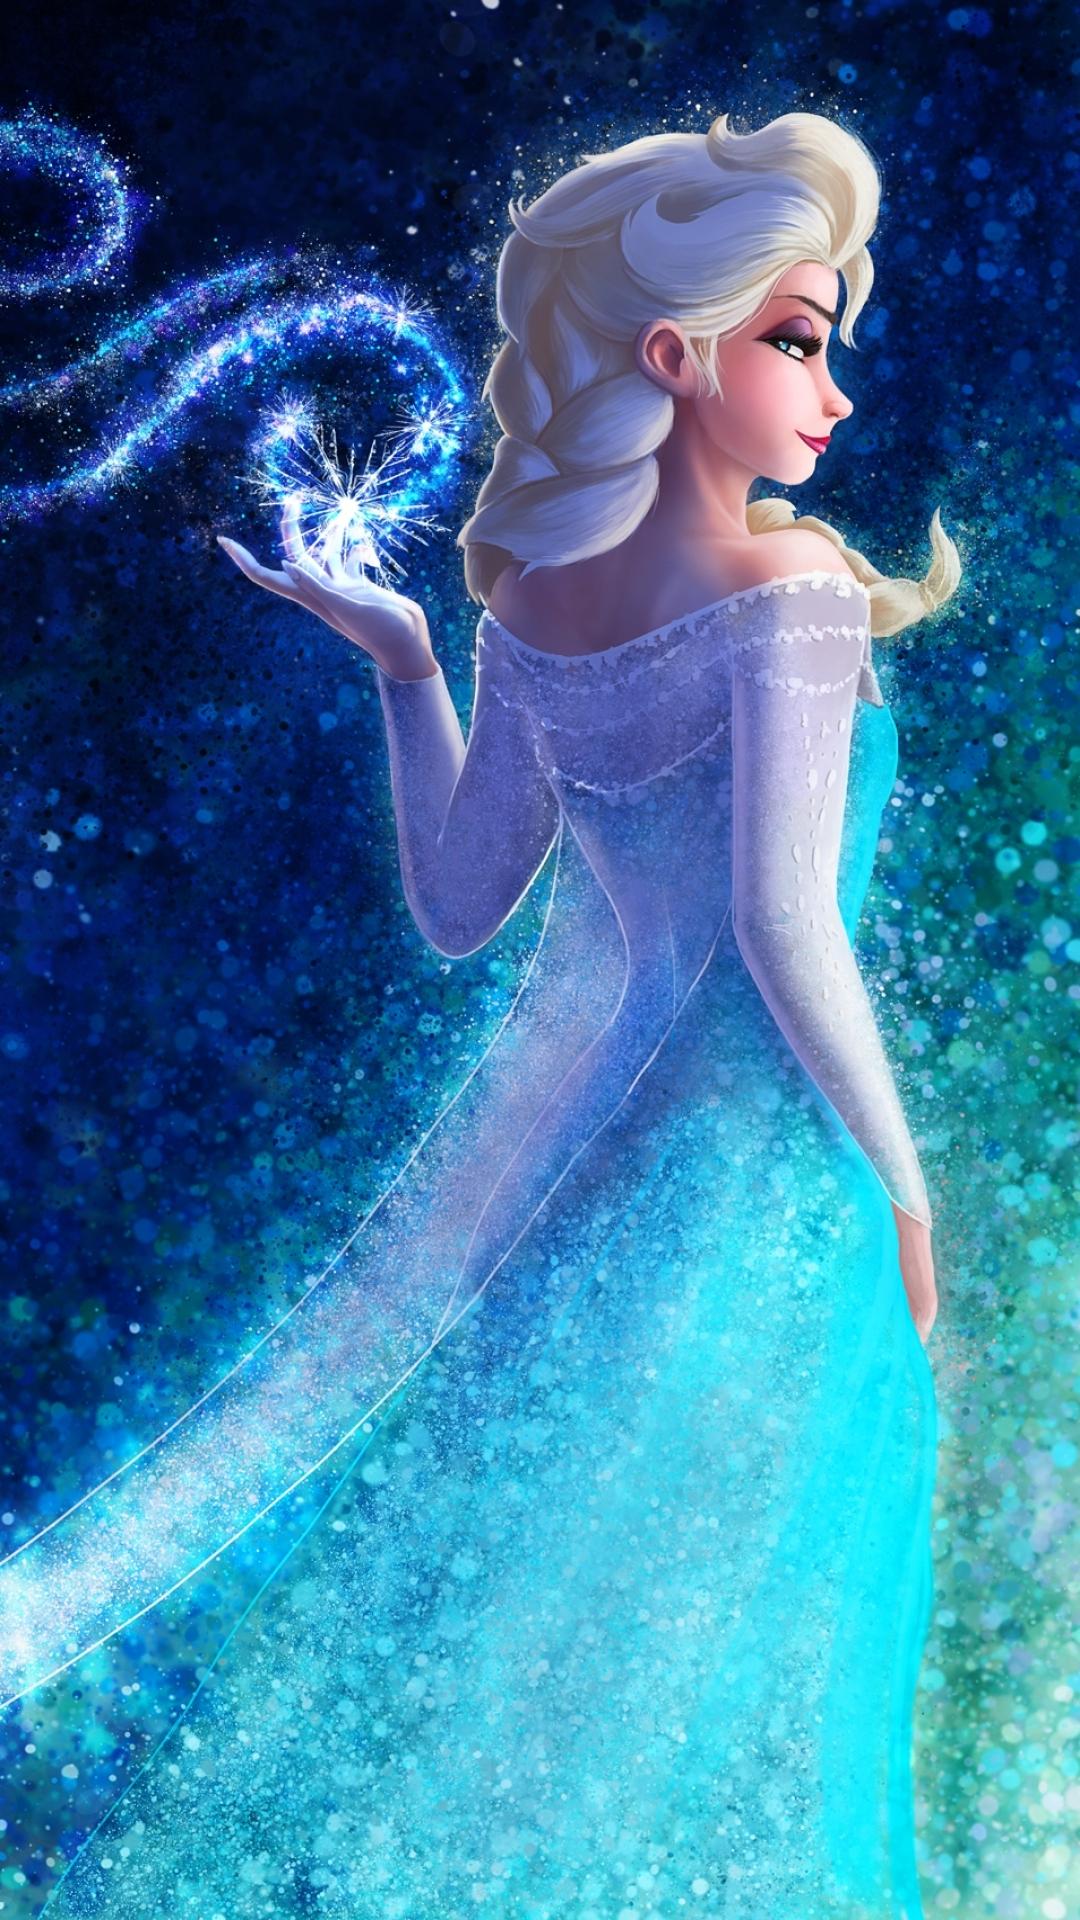 Movie Frozen 1080x1920 Mobile Wallpaper